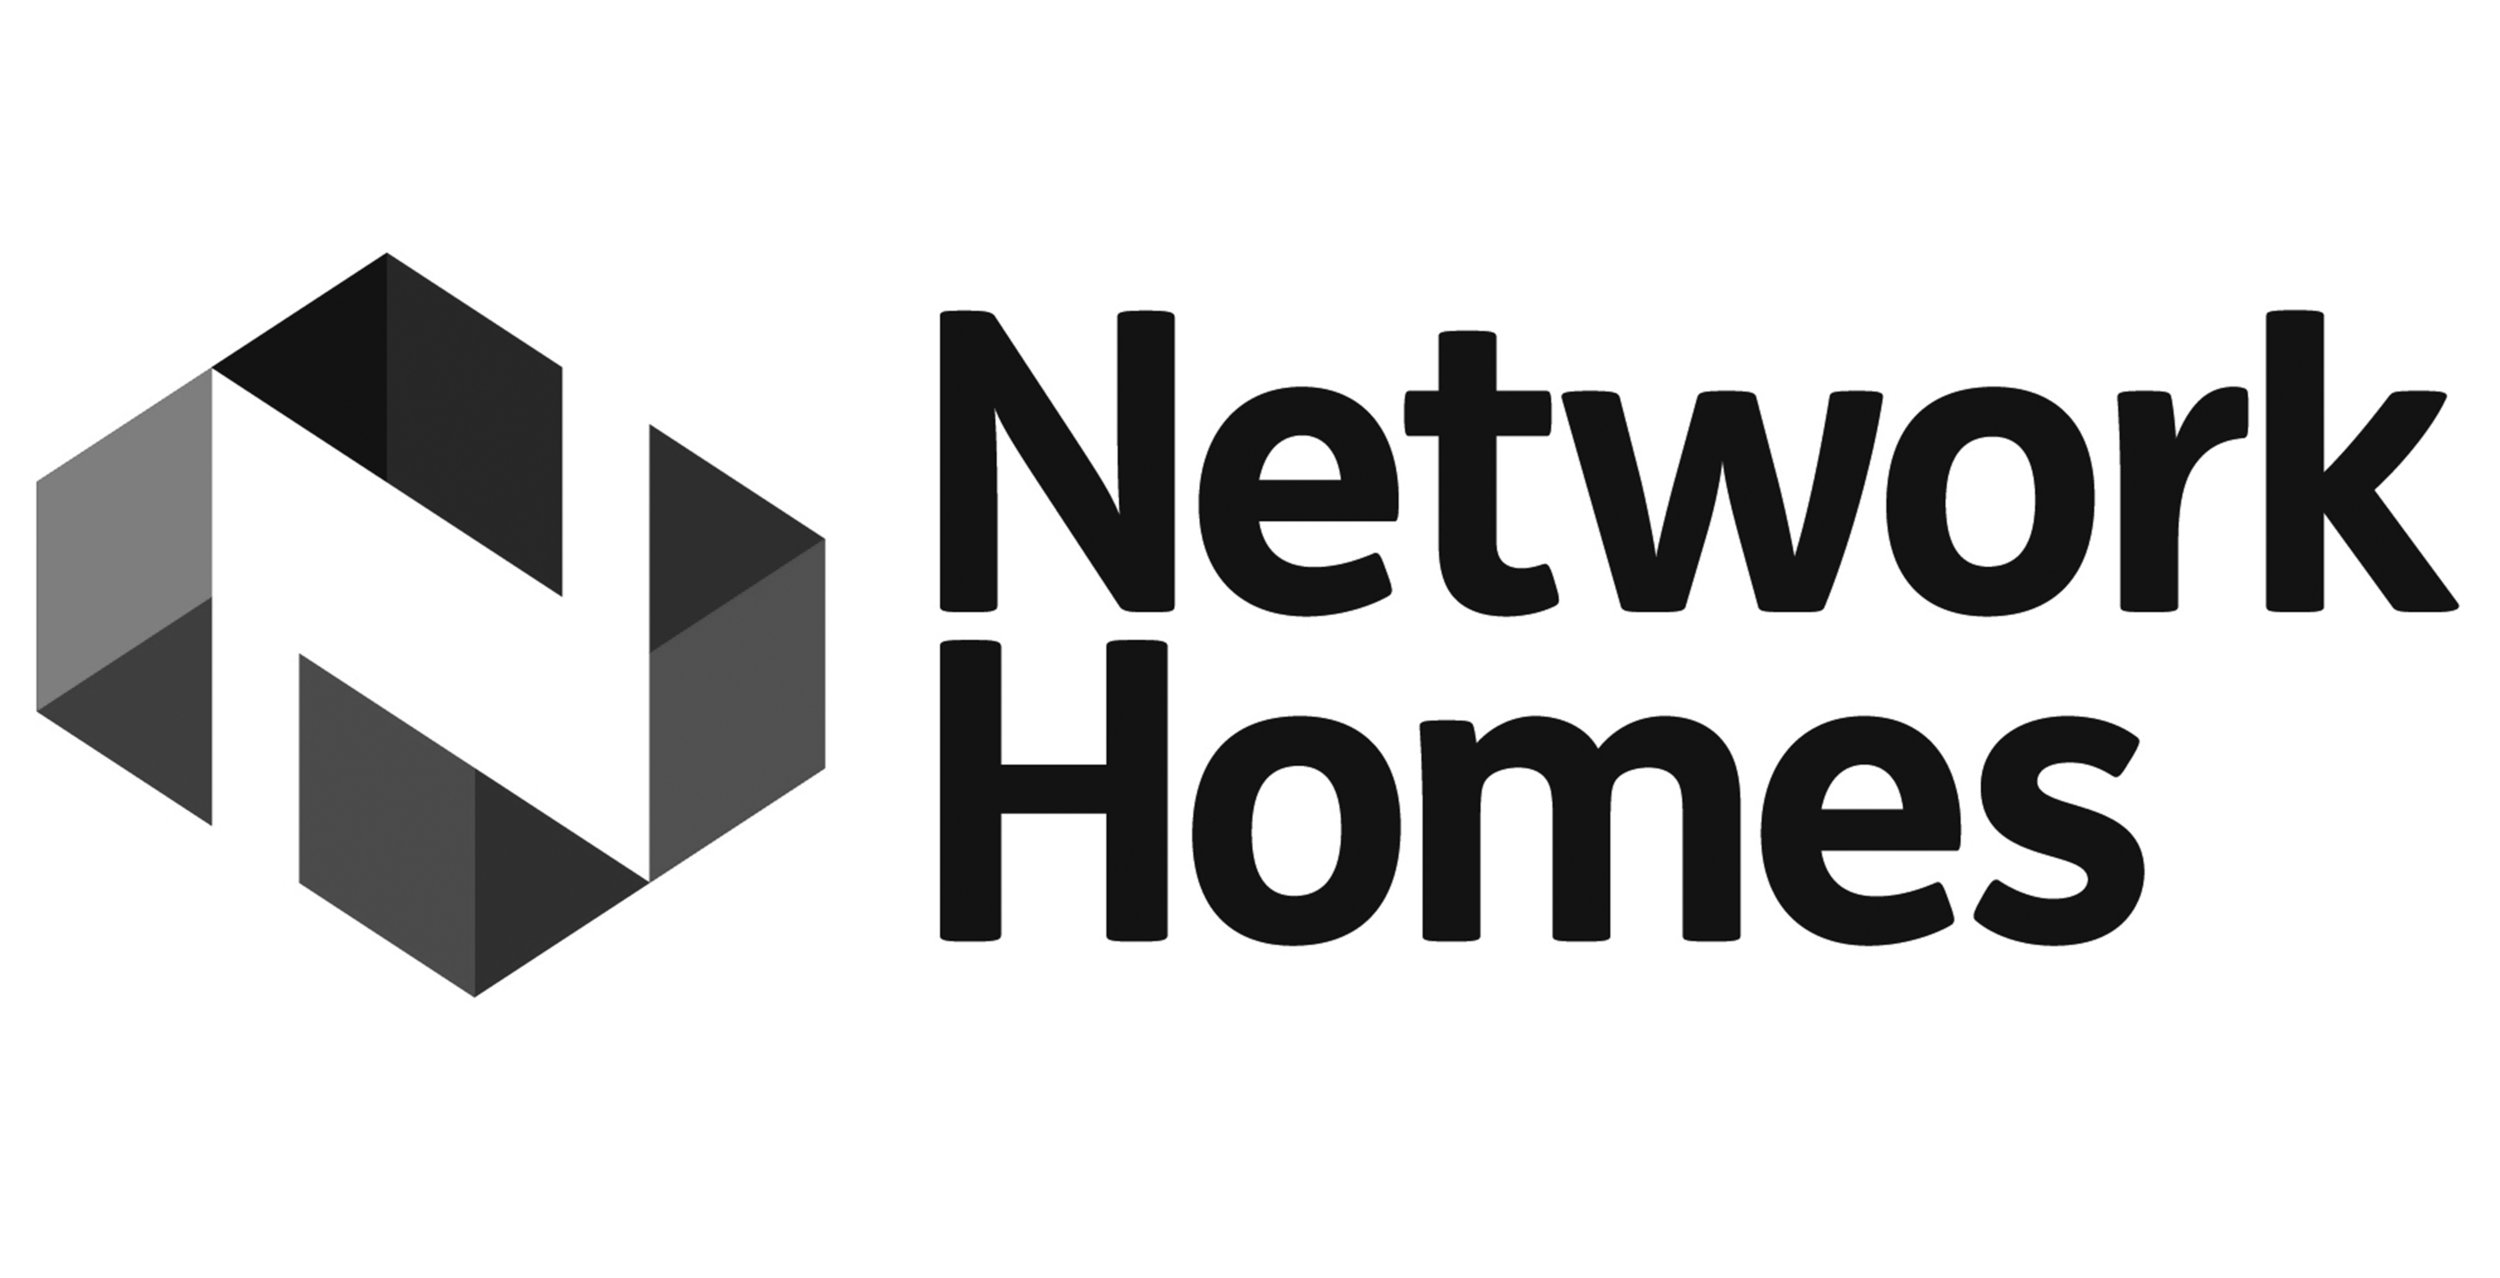 Network homes.jpg